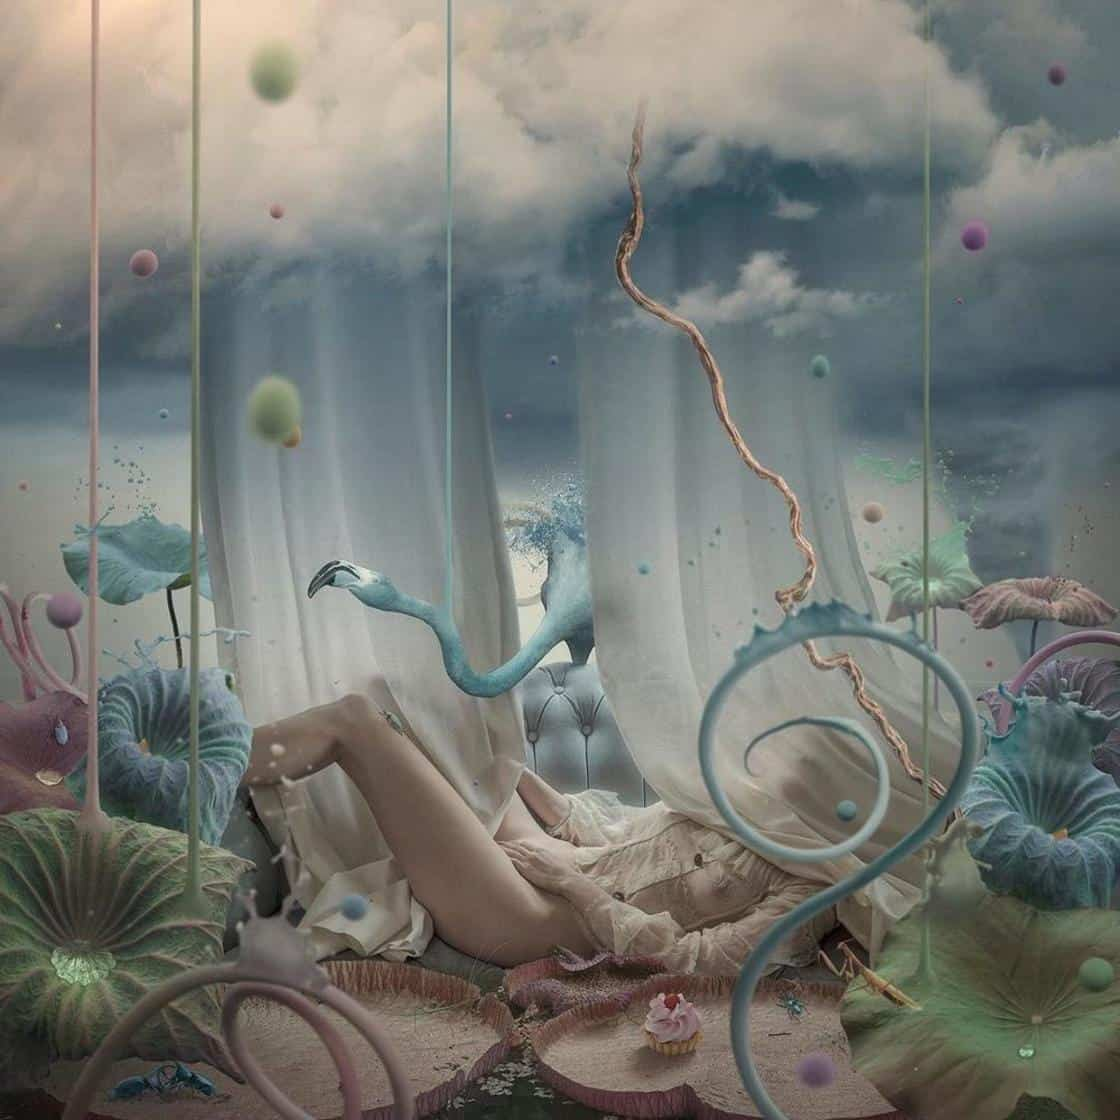 elena vizerskaya surreal photography 16